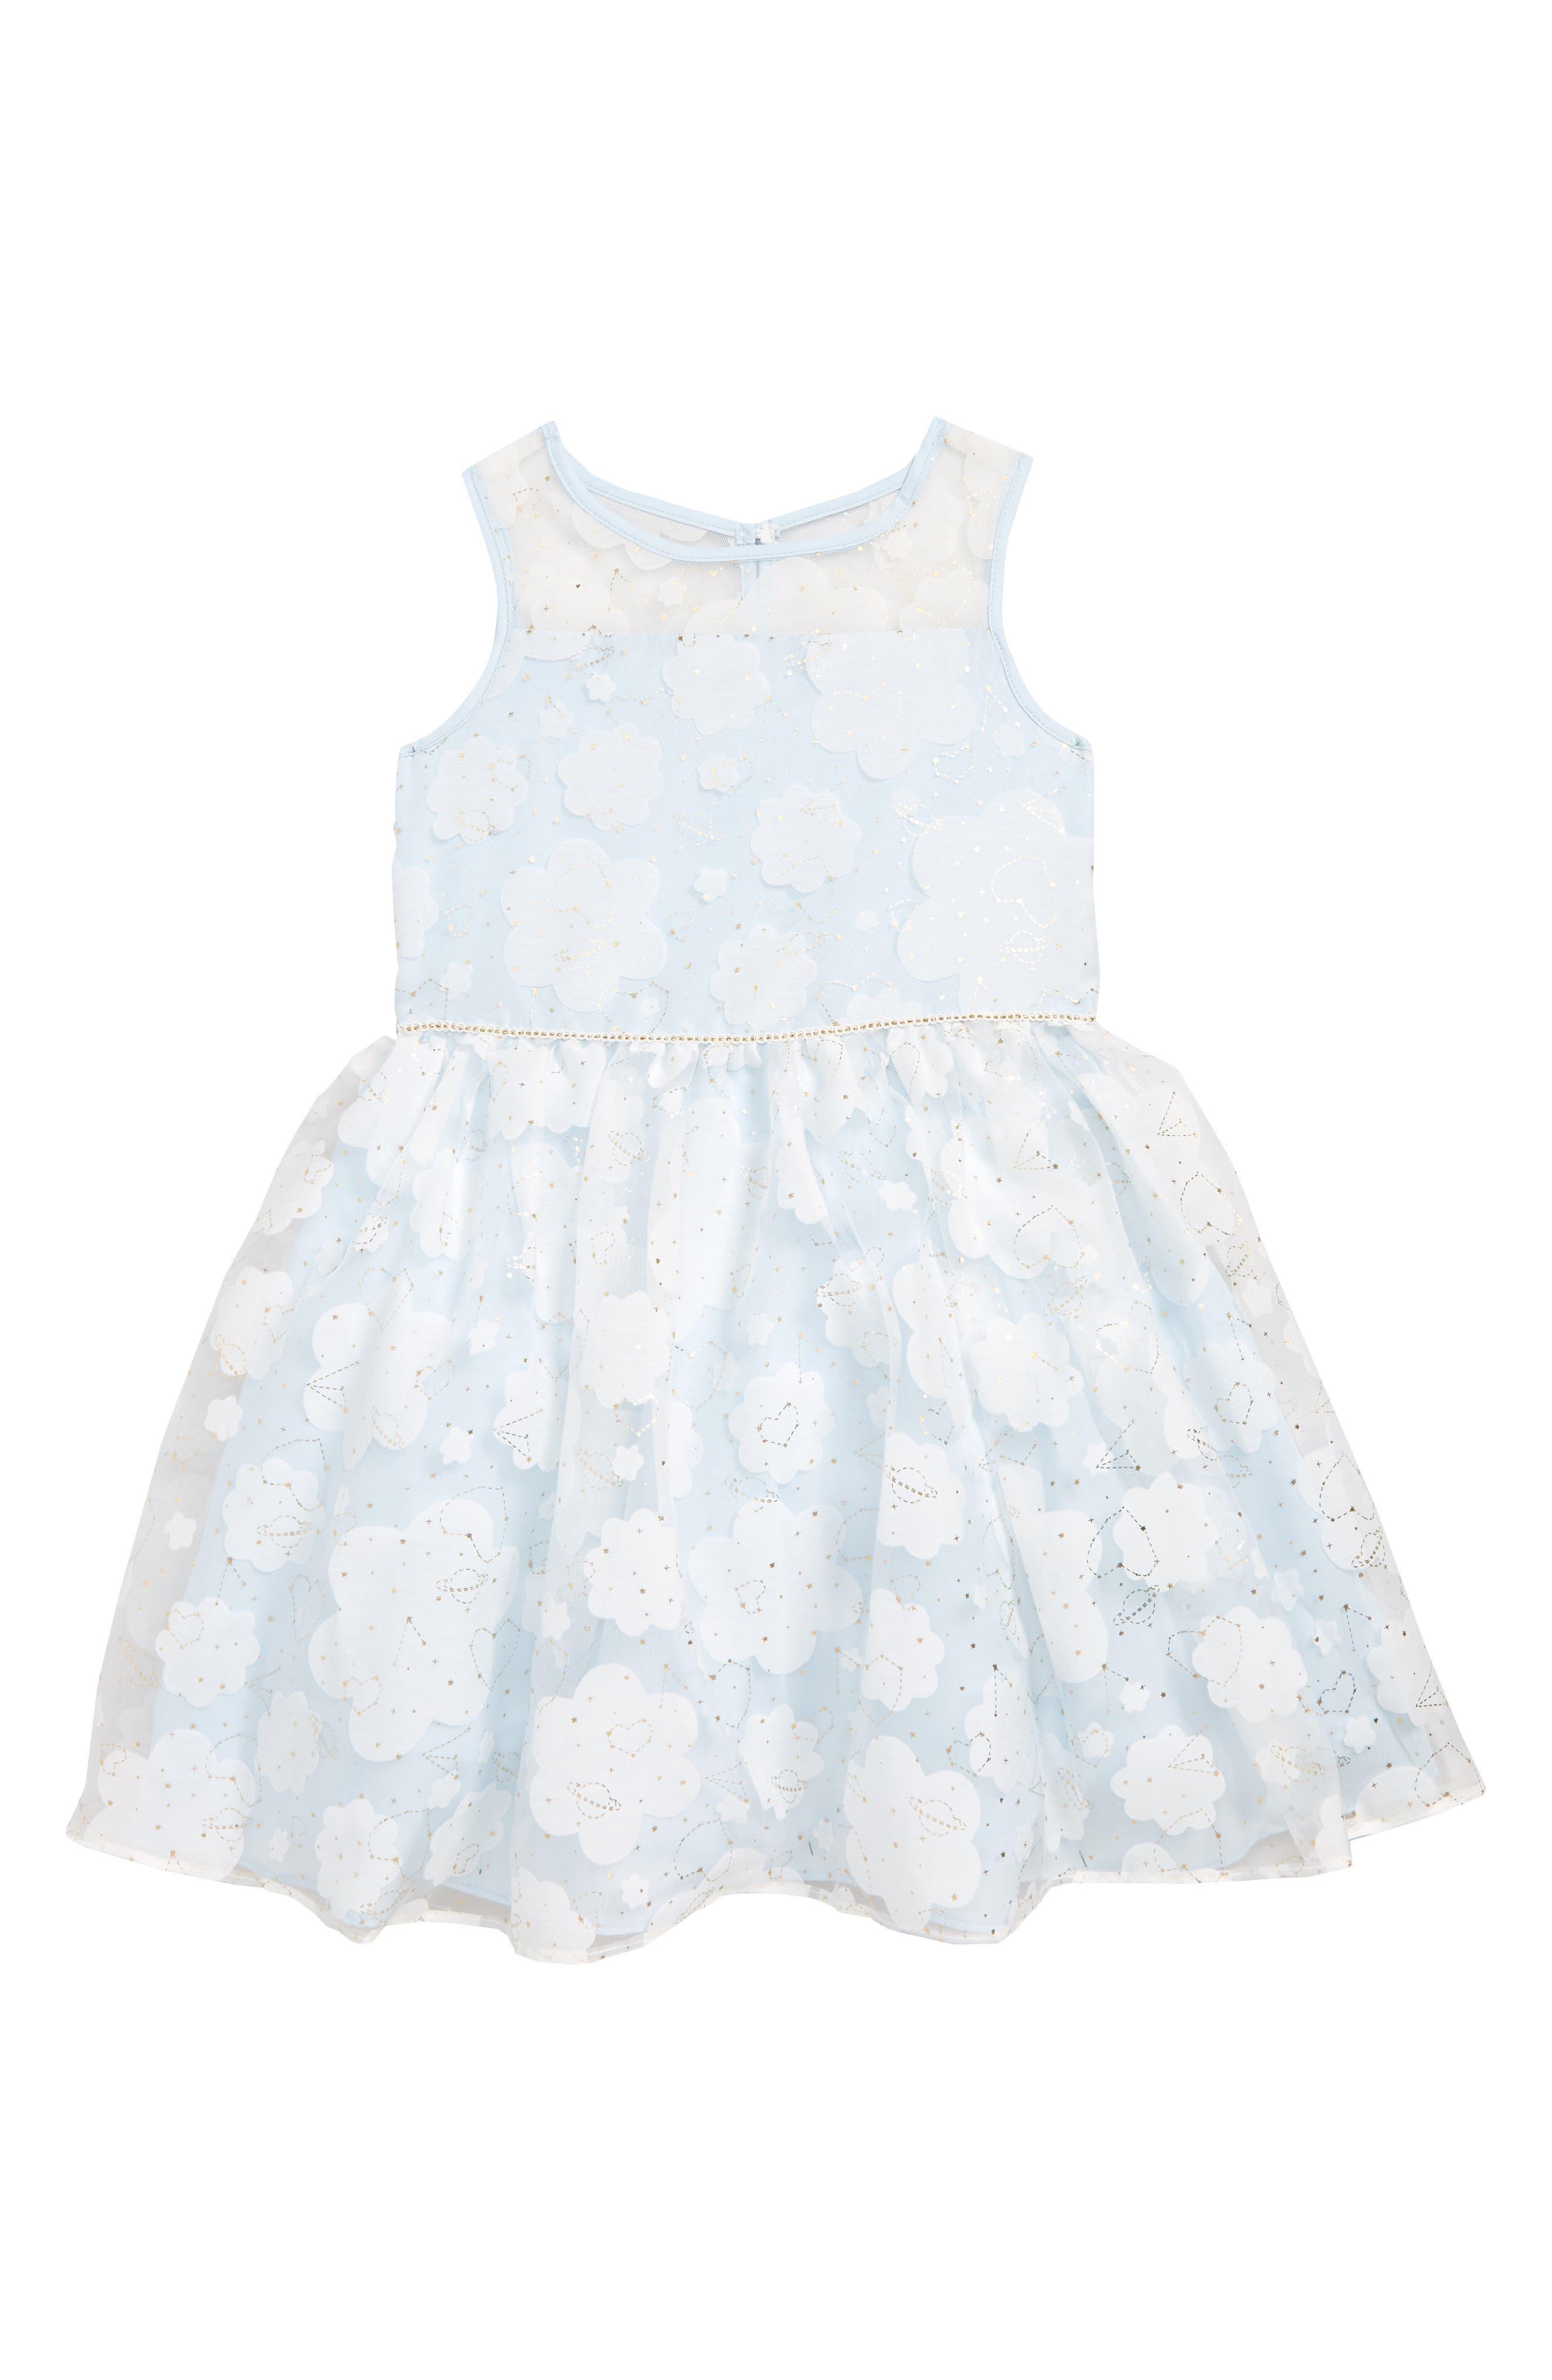 PIPPA & JULIE Constellation Burnout Dress, Main, color, WHITE/ GOLD